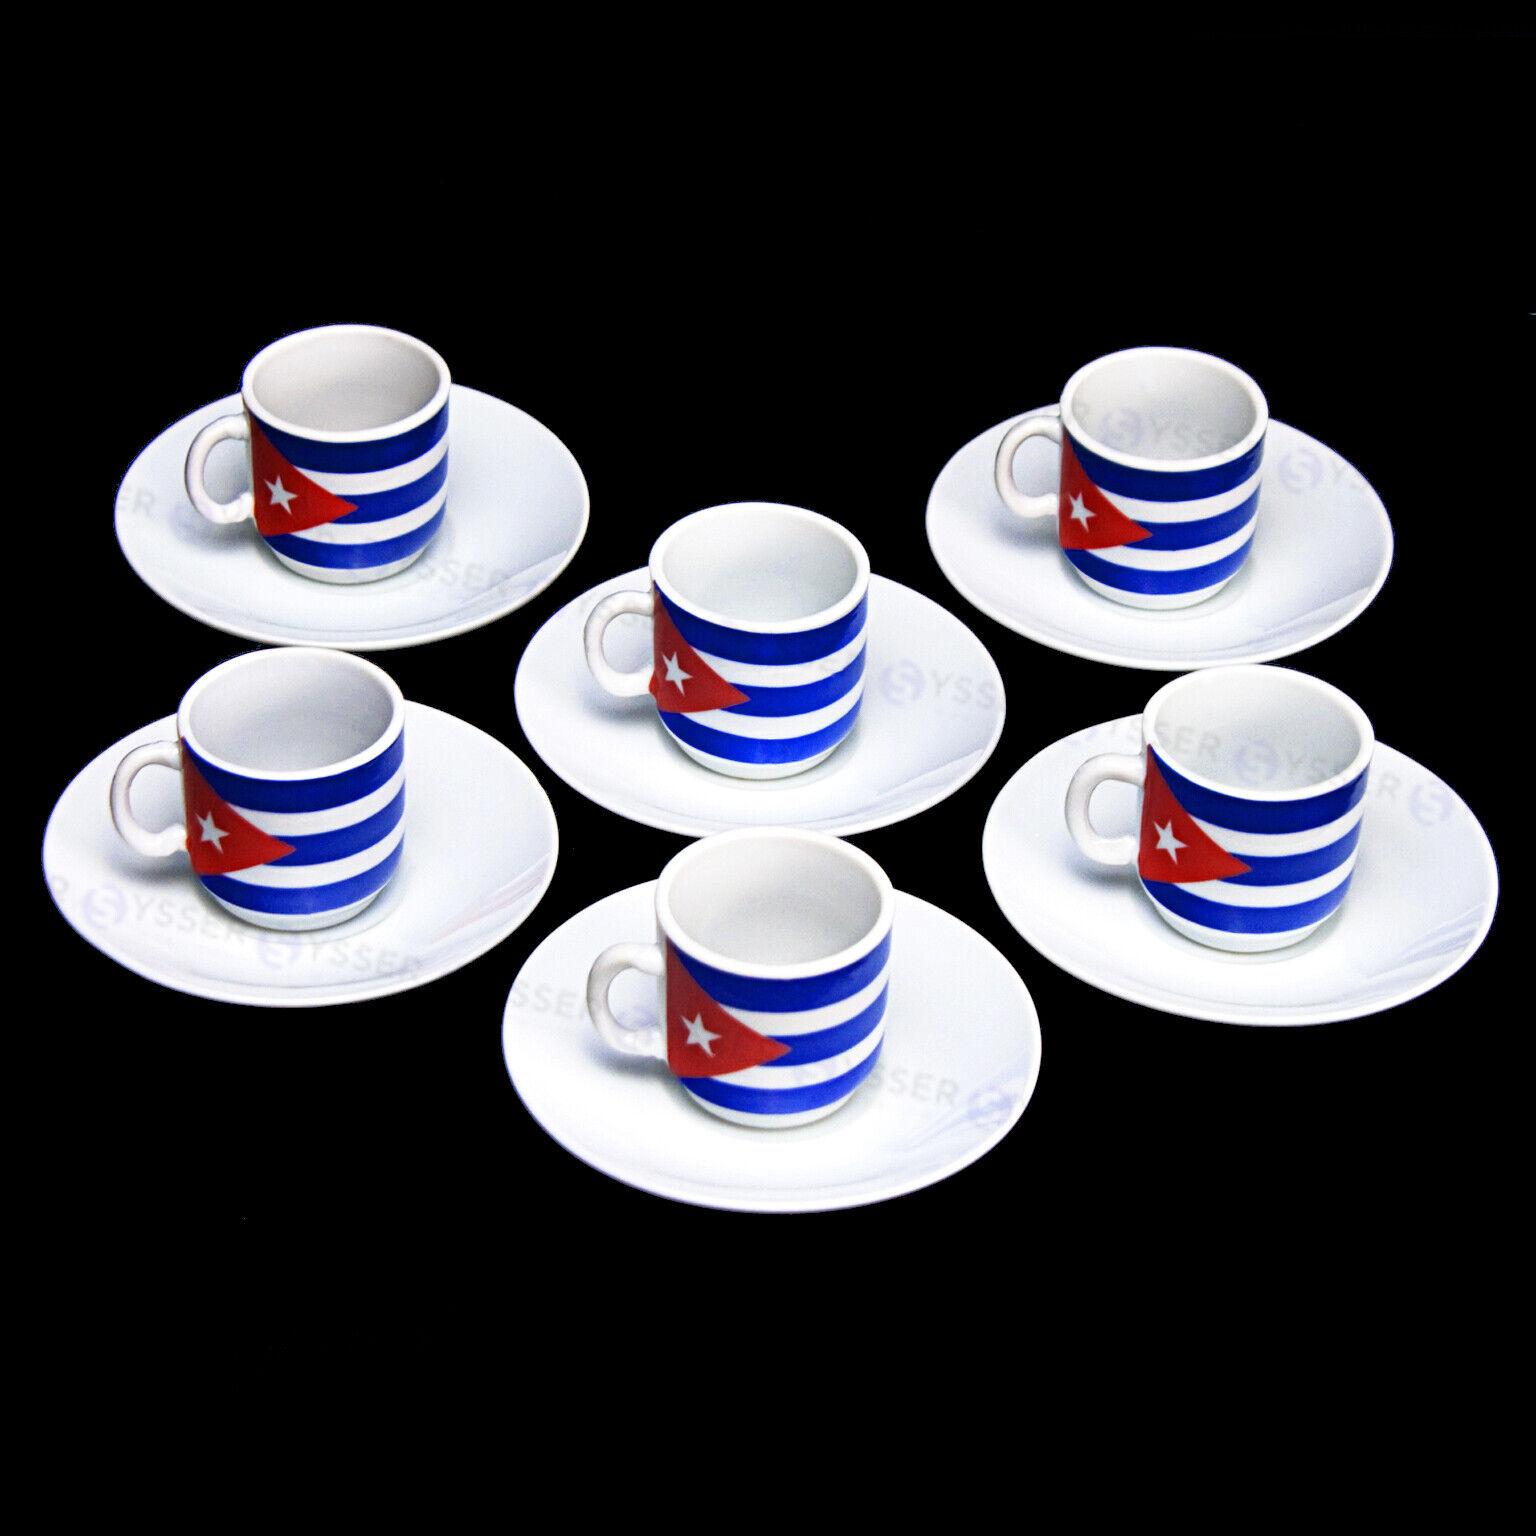 2,0 oz Tazas Cafe Espresso Coffee Cuban Flag Cups Set 12 Pie